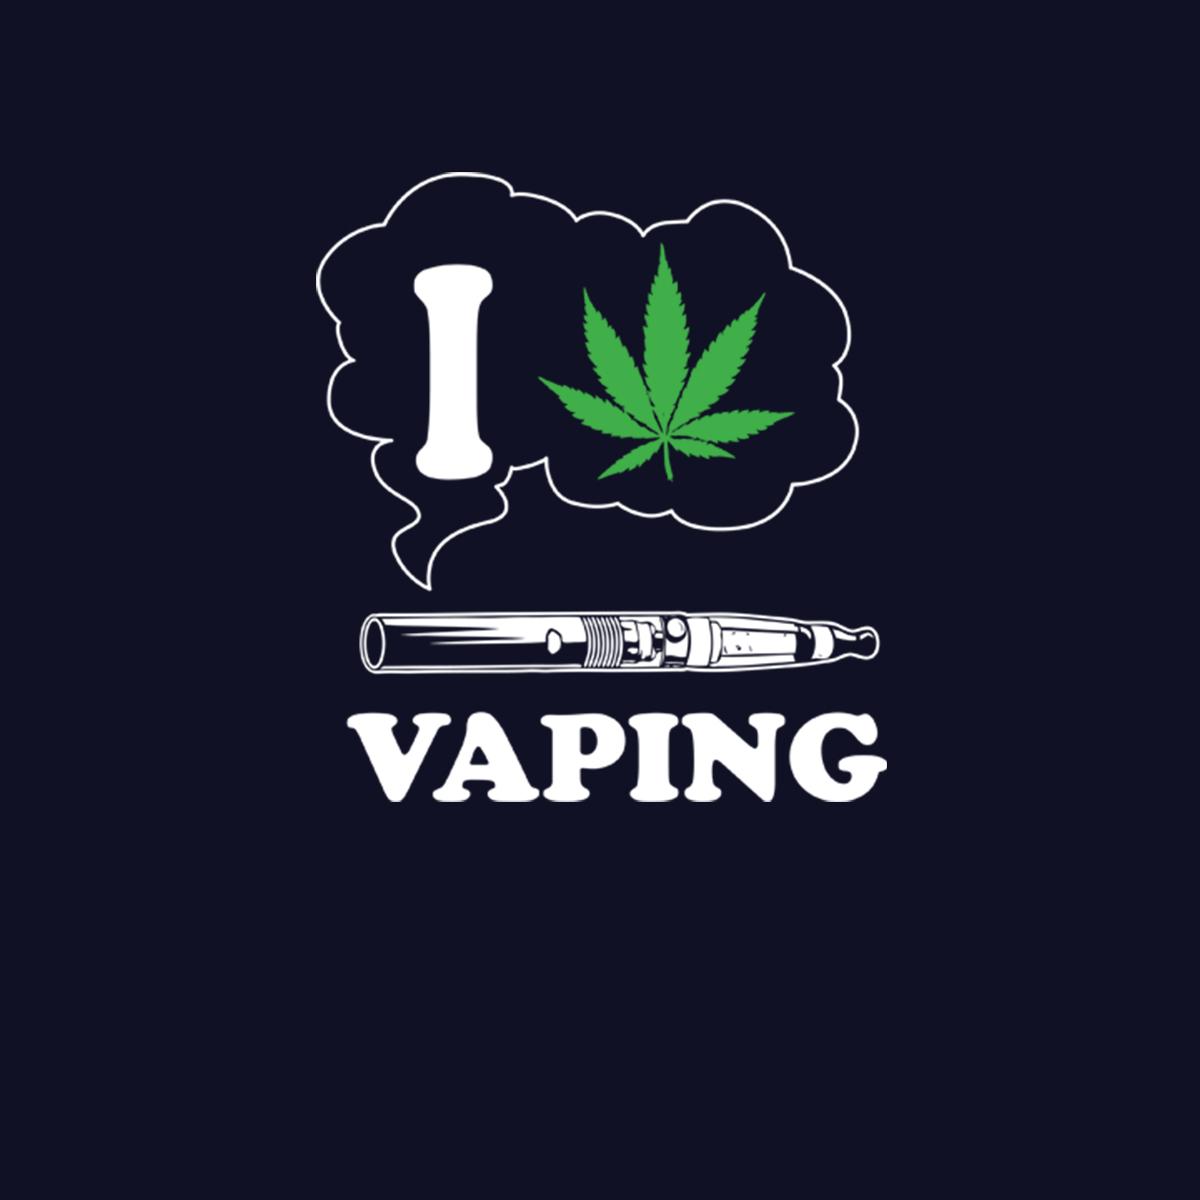 I Love Vaping Cannabis Marijuana Men T-shirt XS-5XL New